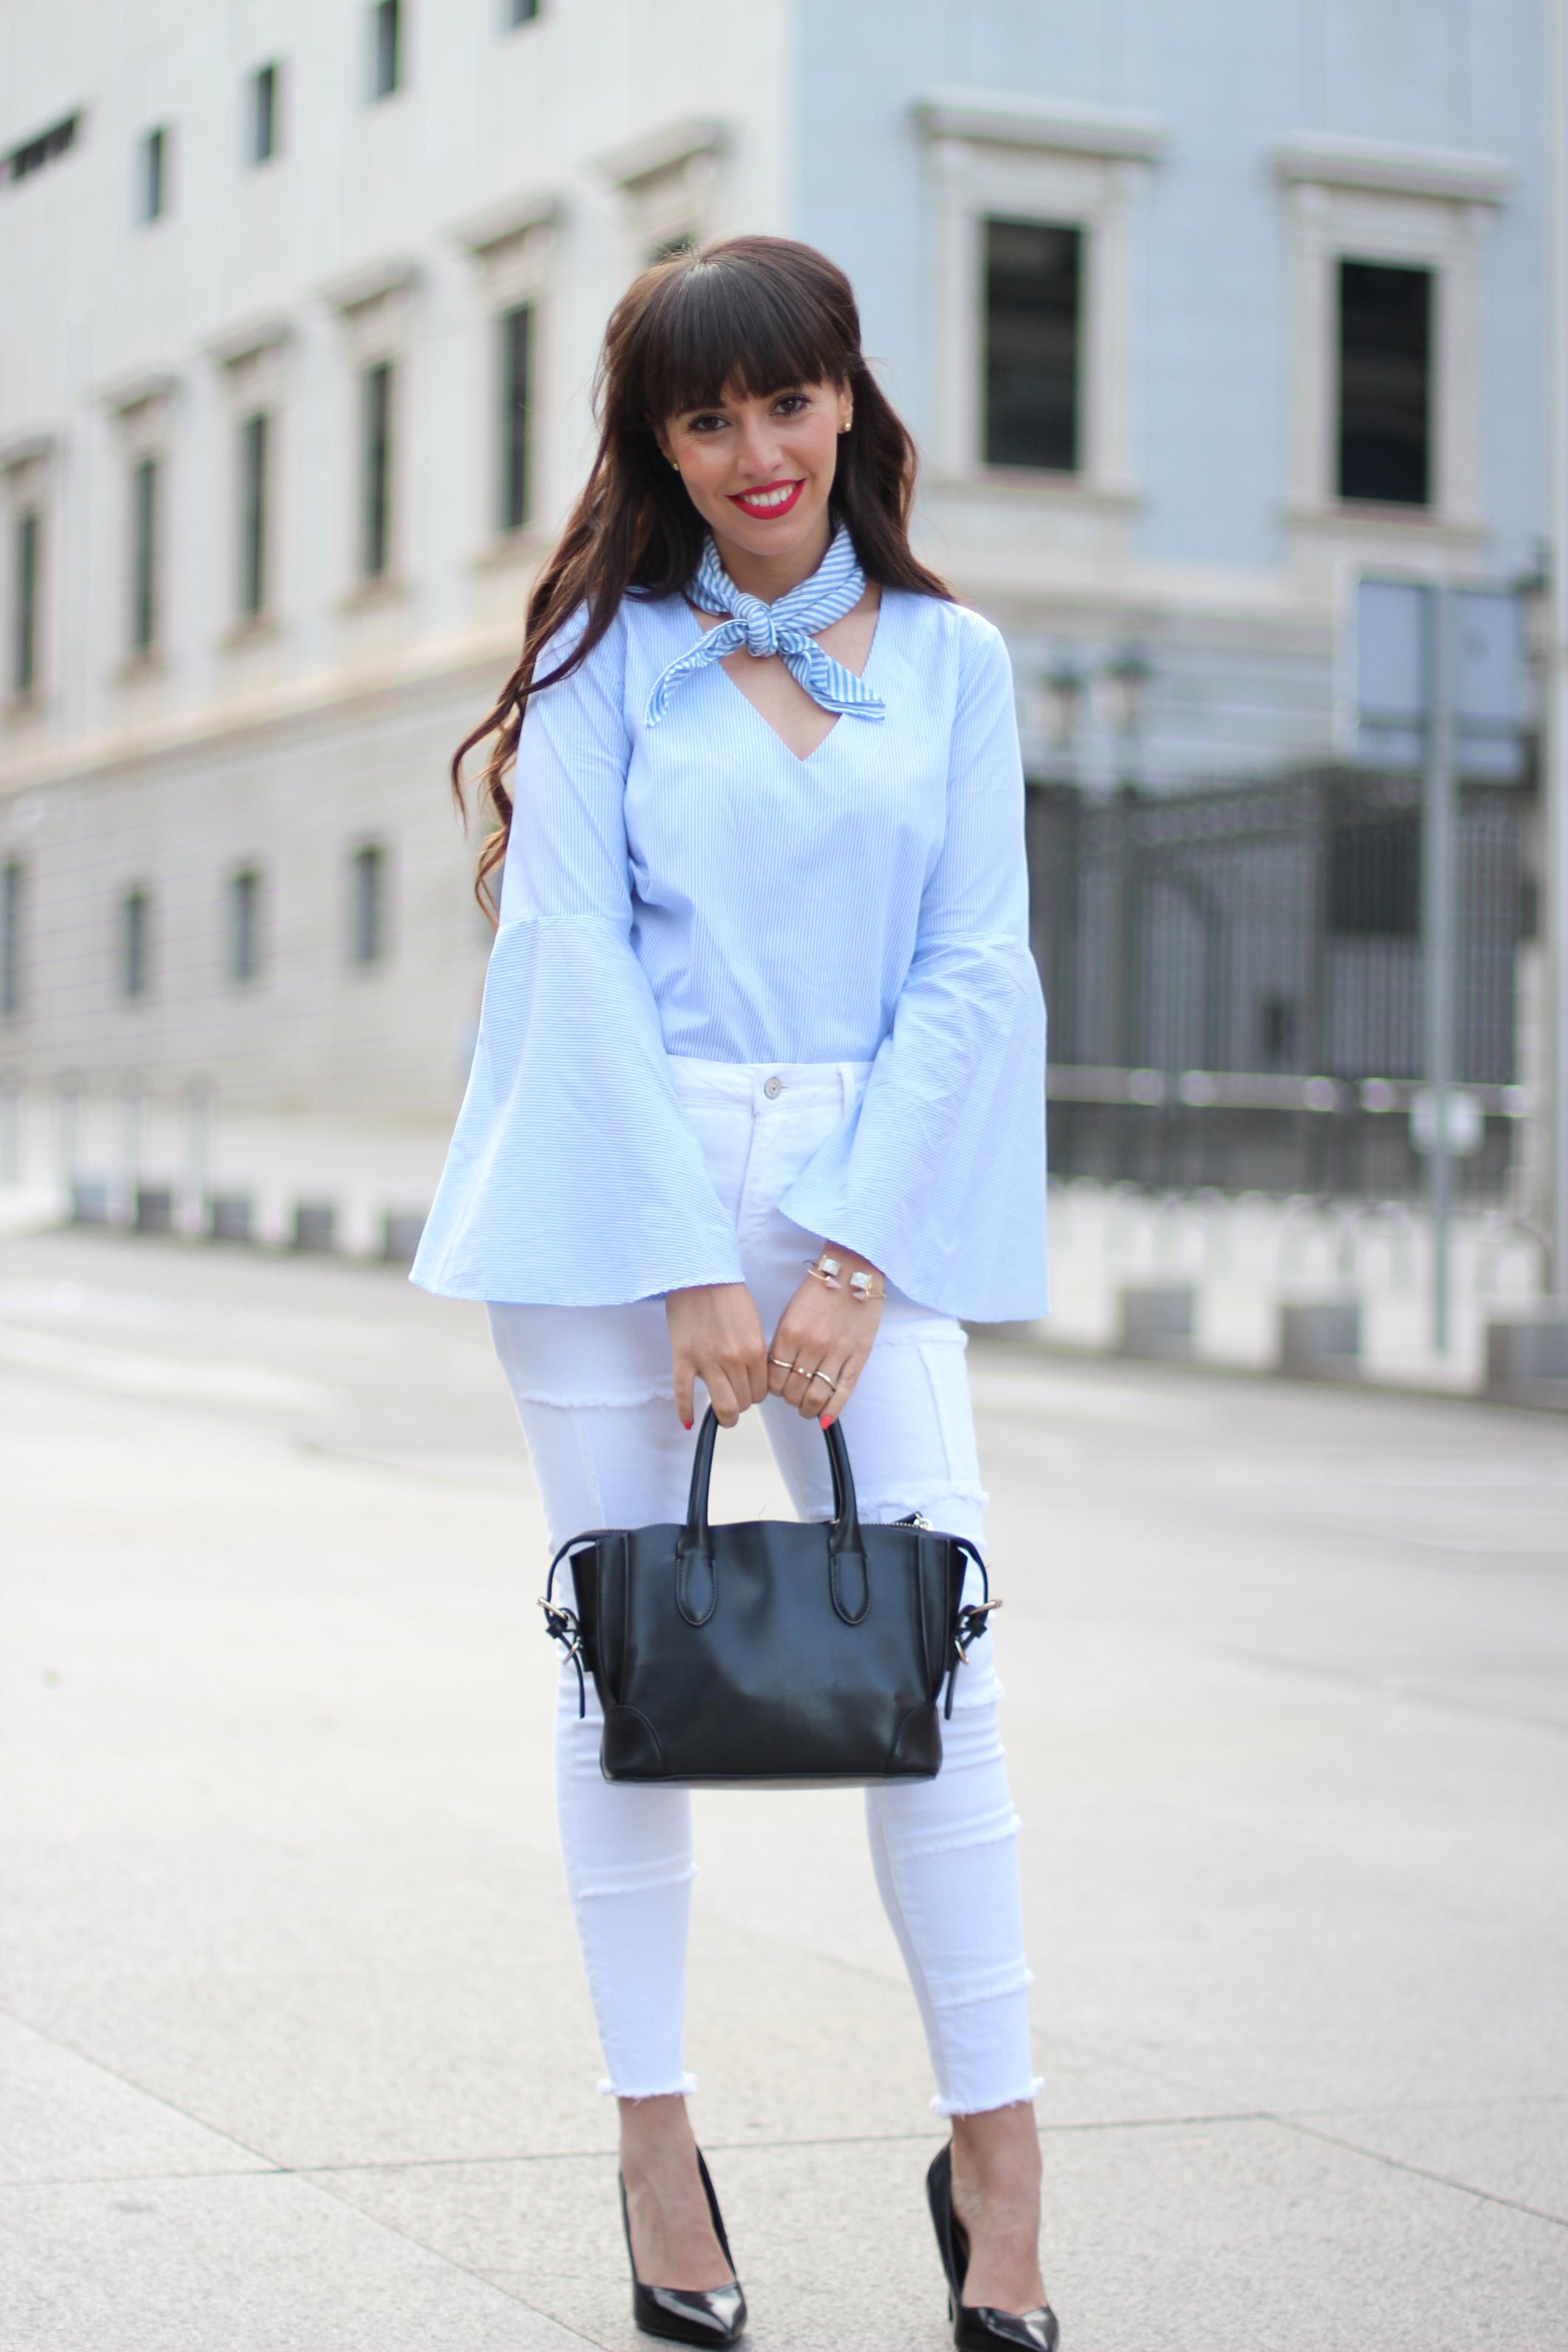 Flared-sleeves_patchwork-pants_skinny-scarf_spring-street-style_(2)